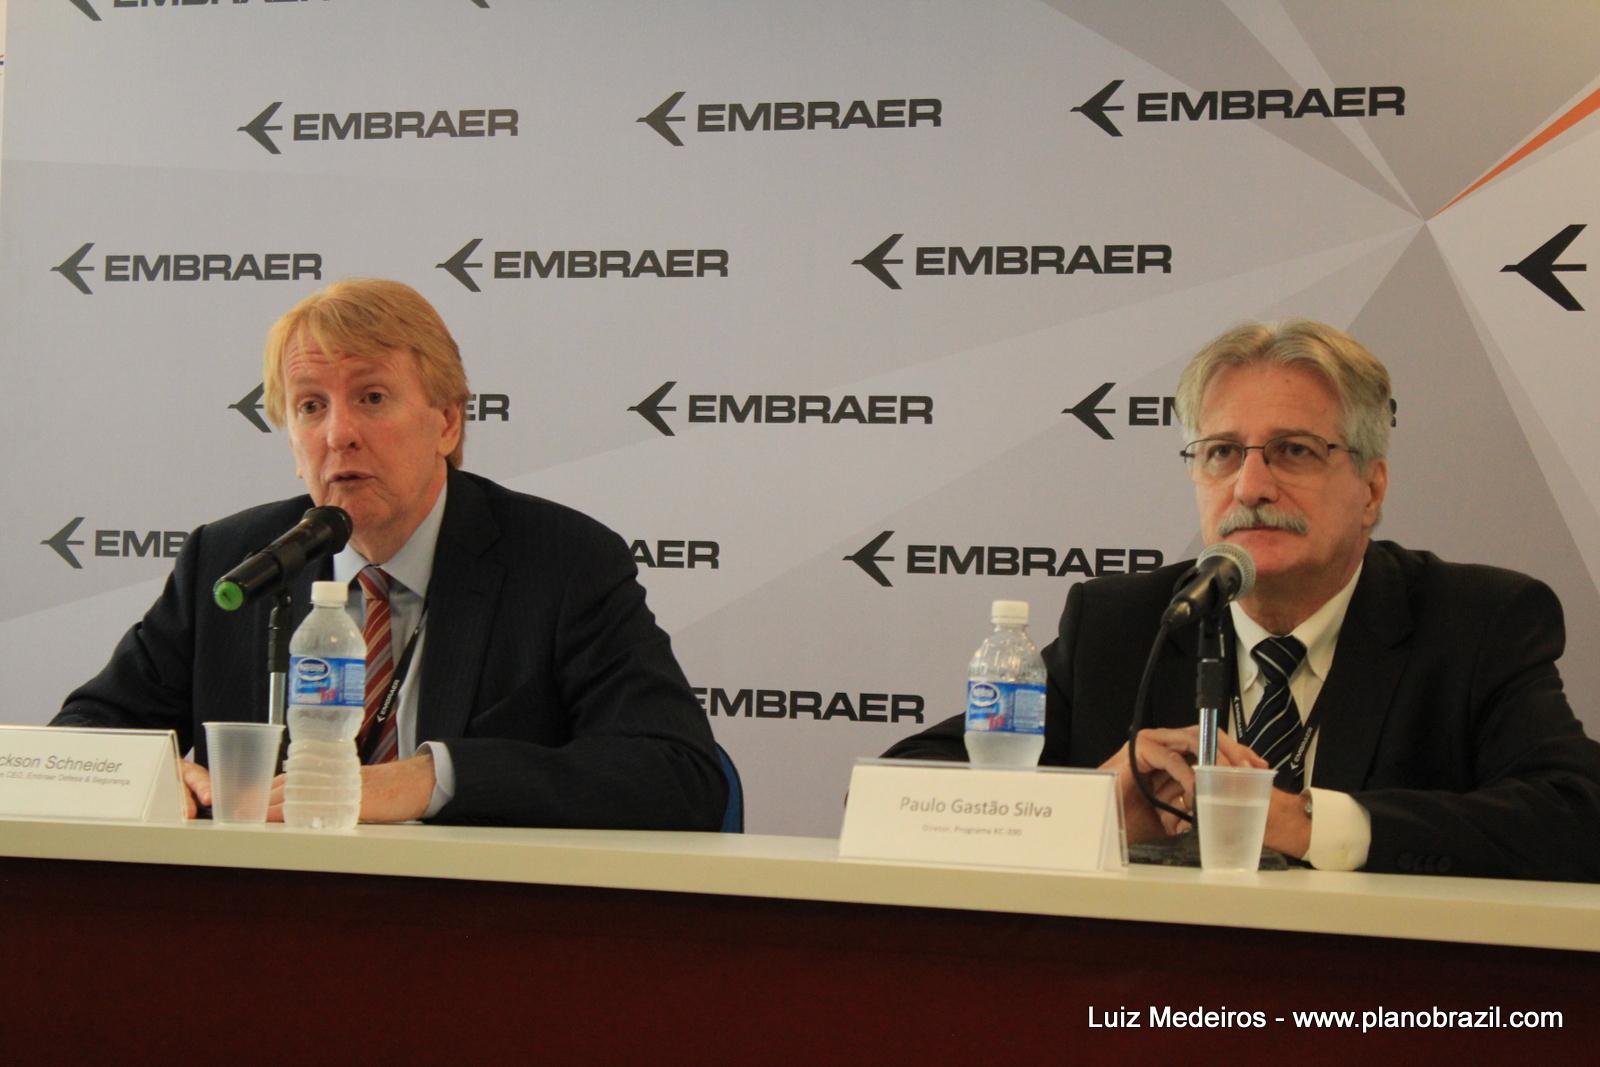 LAAD 2017: Coletiva de Imprensa - Embraer e o andamento do programa KC-390